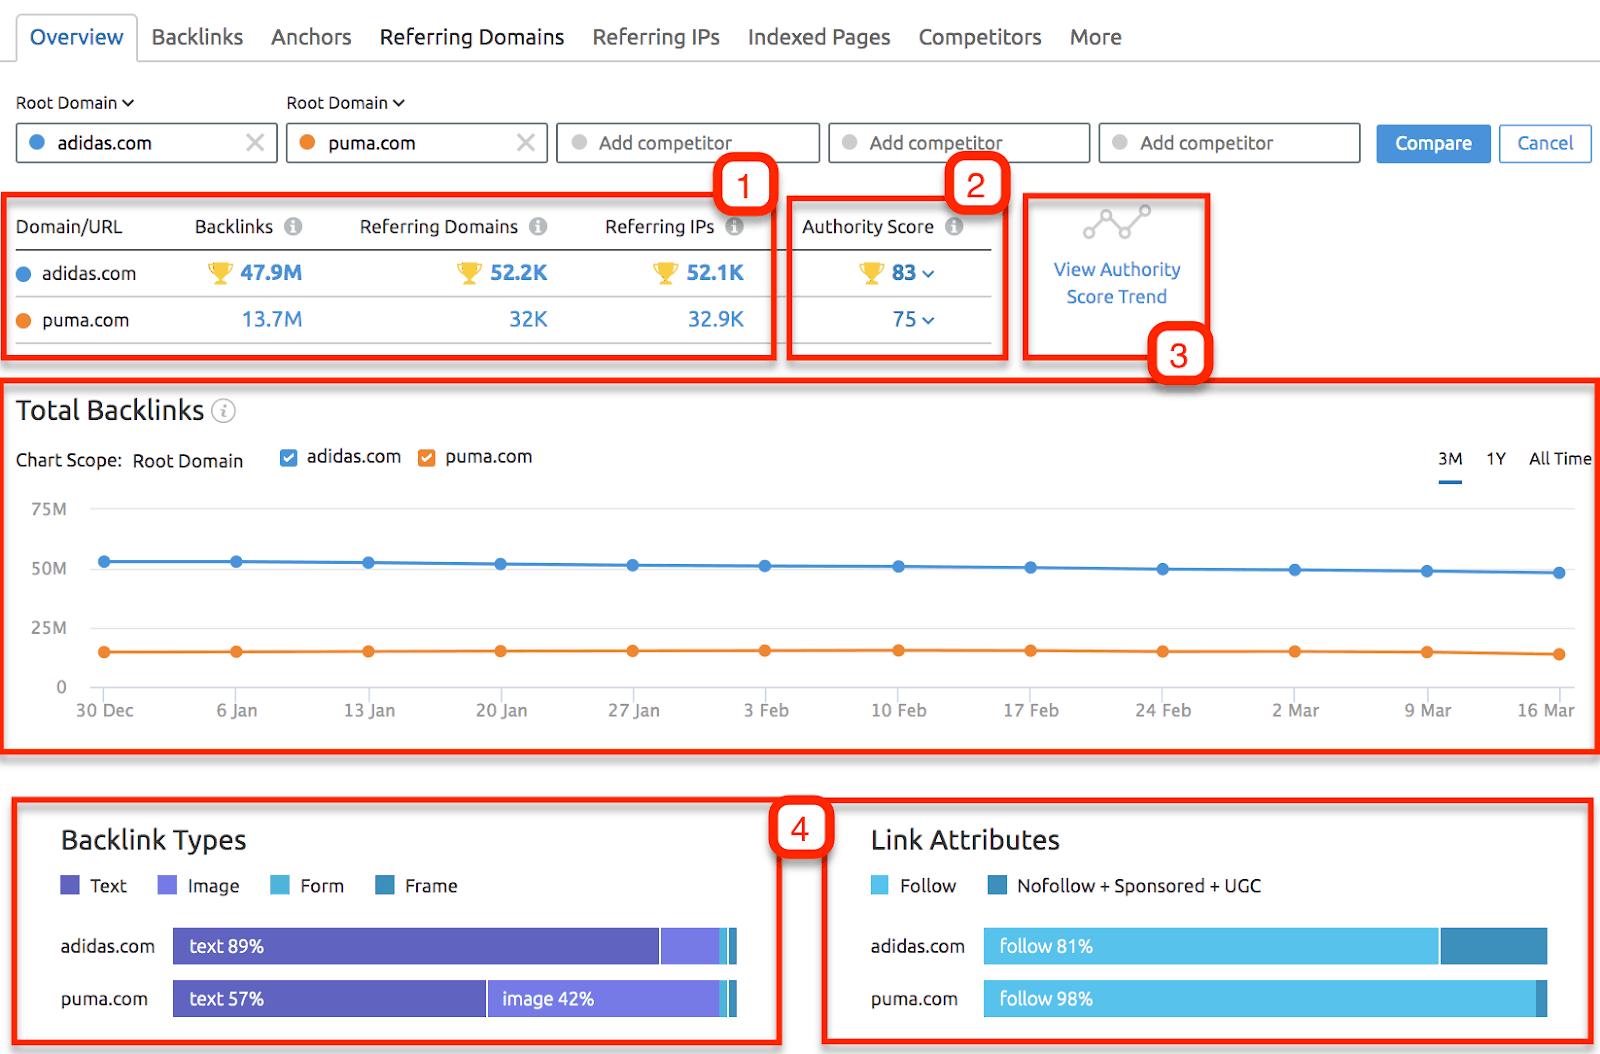 compare-backlinks-domains-semrush